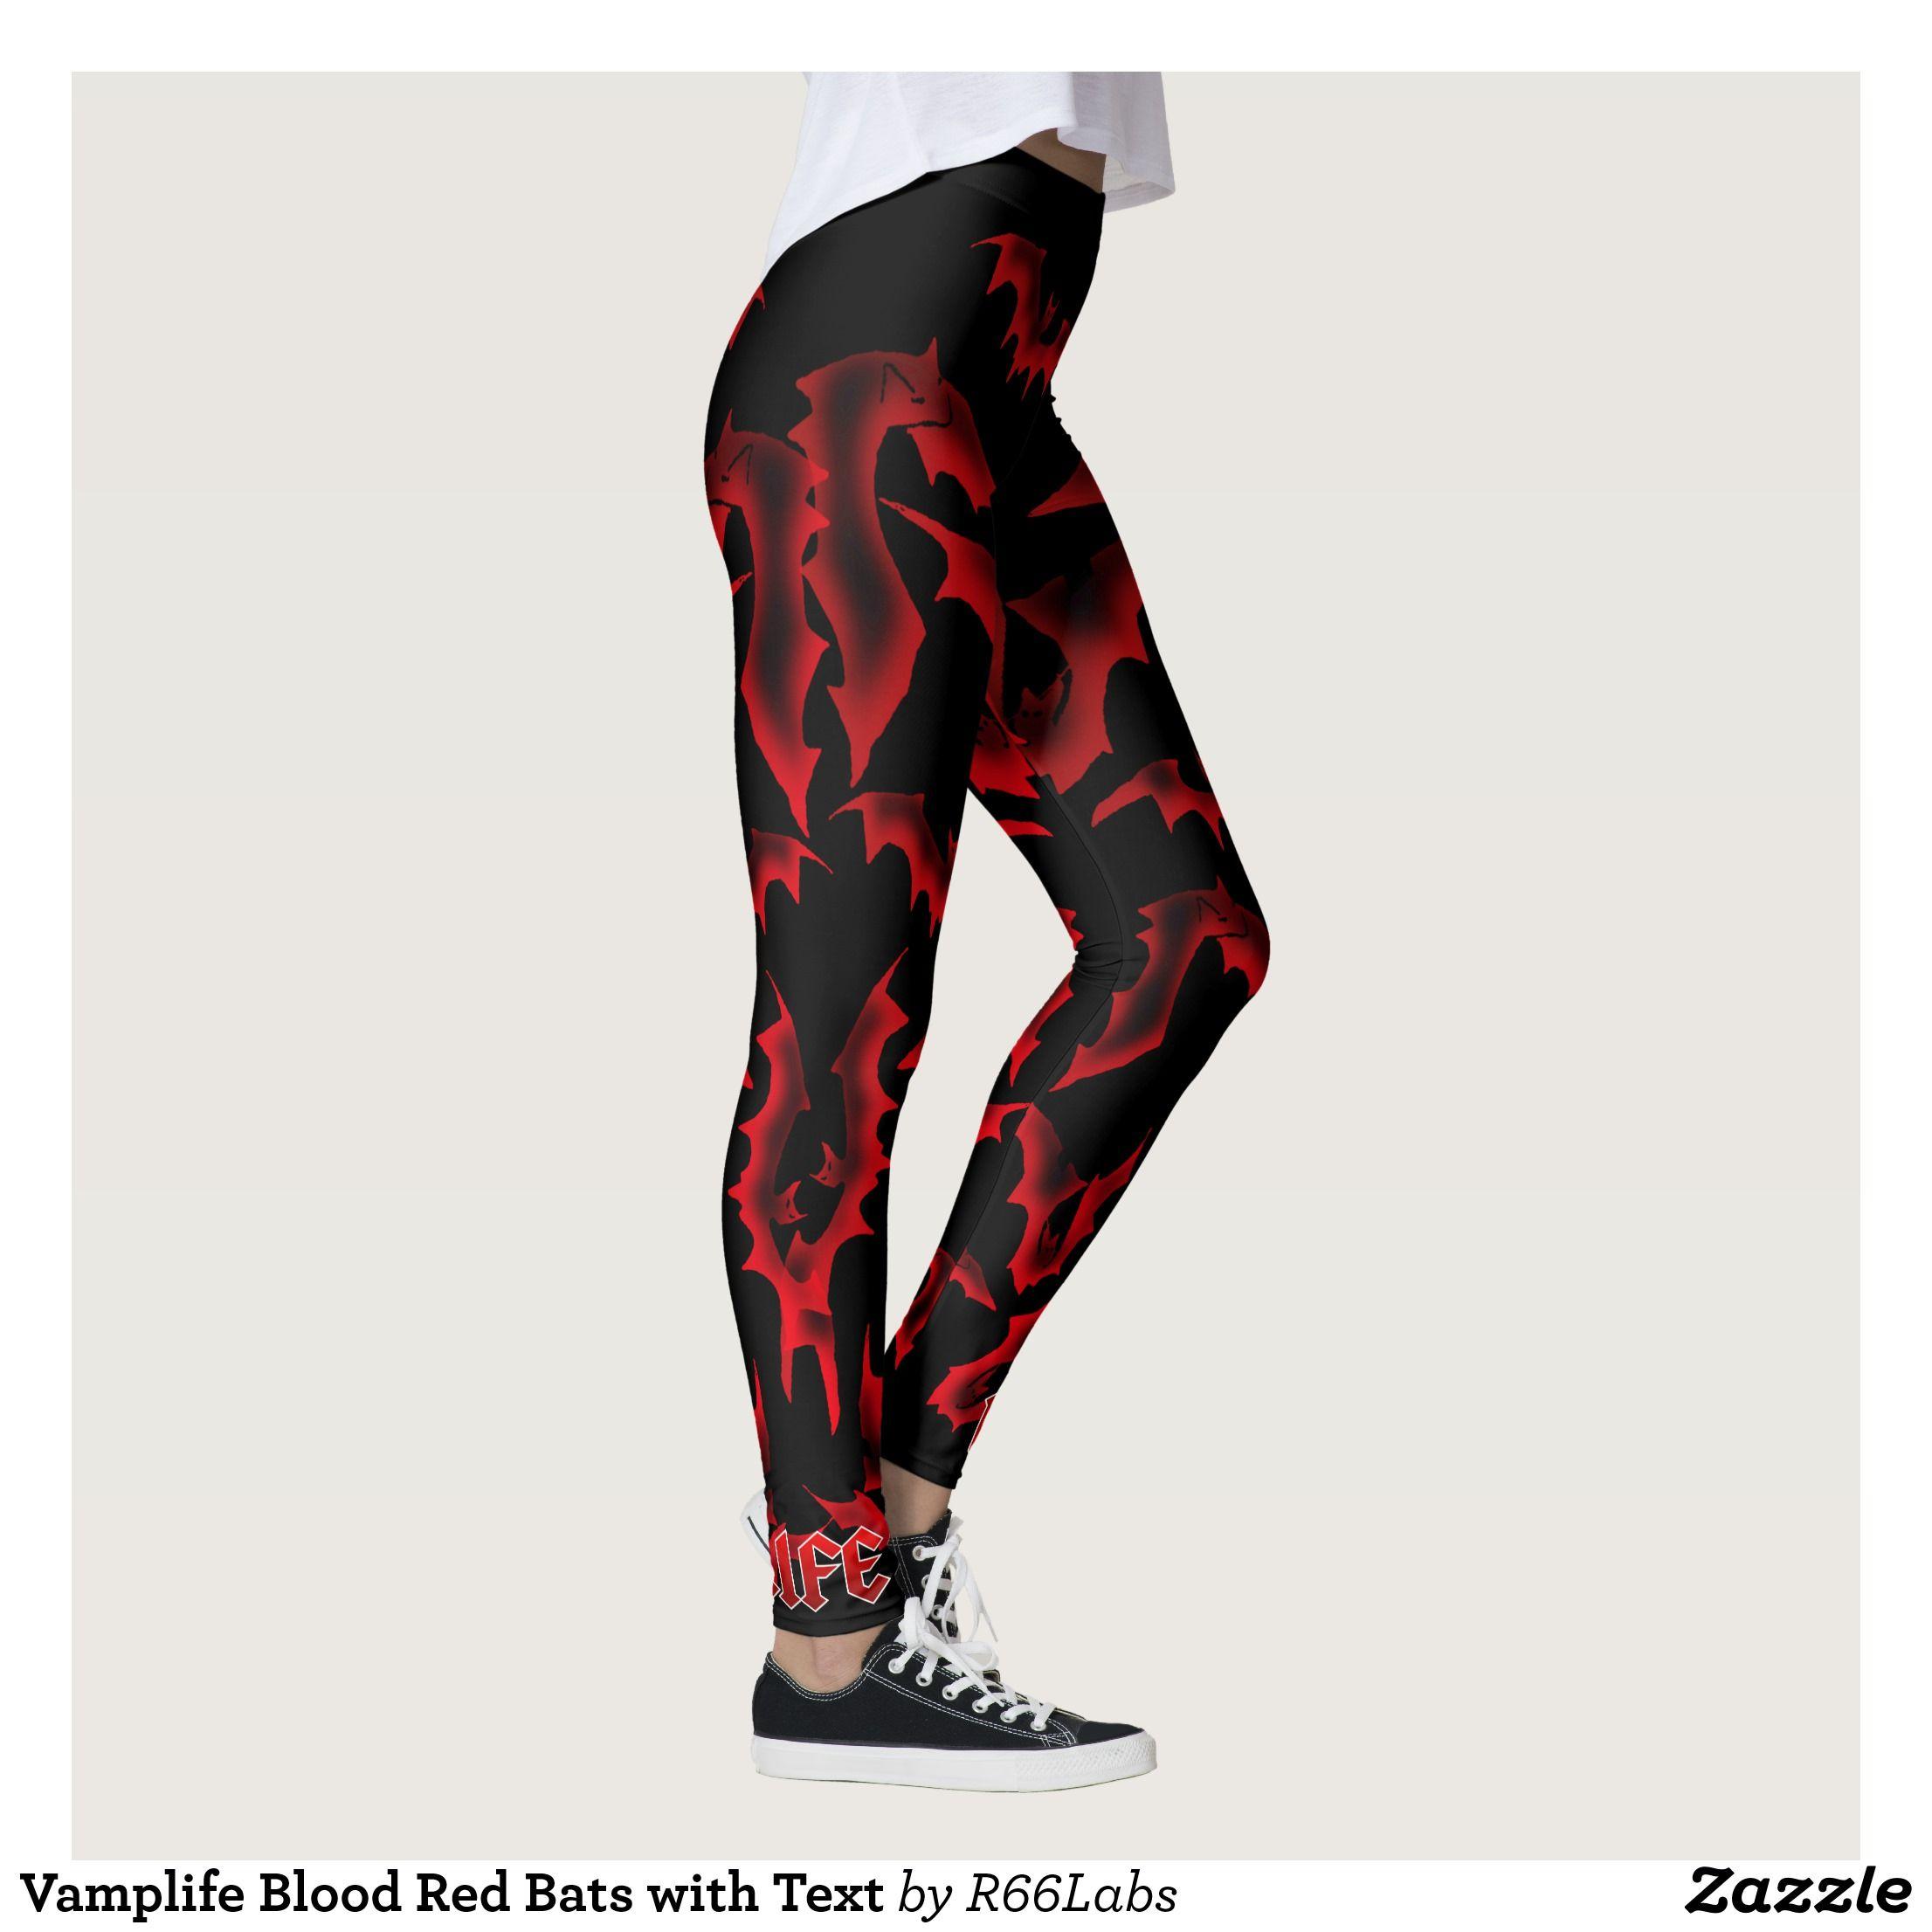 e4398521dba7 Vamplife Blood Red Bats with Text Leggings   Beautiful  Yoga Pants -   Exercise Leggings